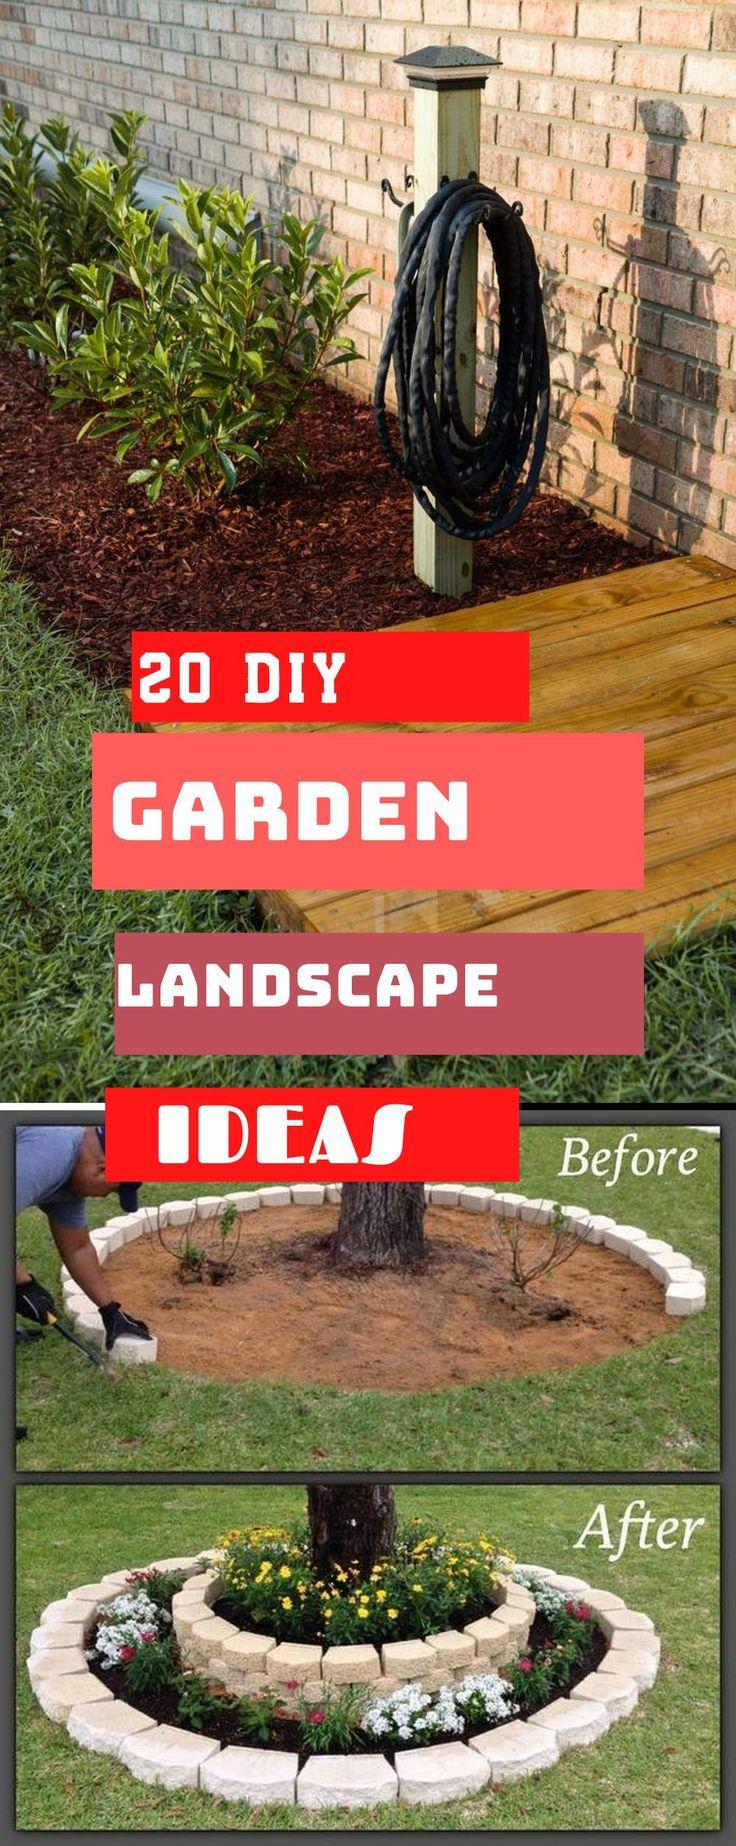 Garden Landscaping Design In 2021 Garden Landscape Design Diy Garden Landscaping Garden Landscaping Backyard Backyard diy landscaping ideas